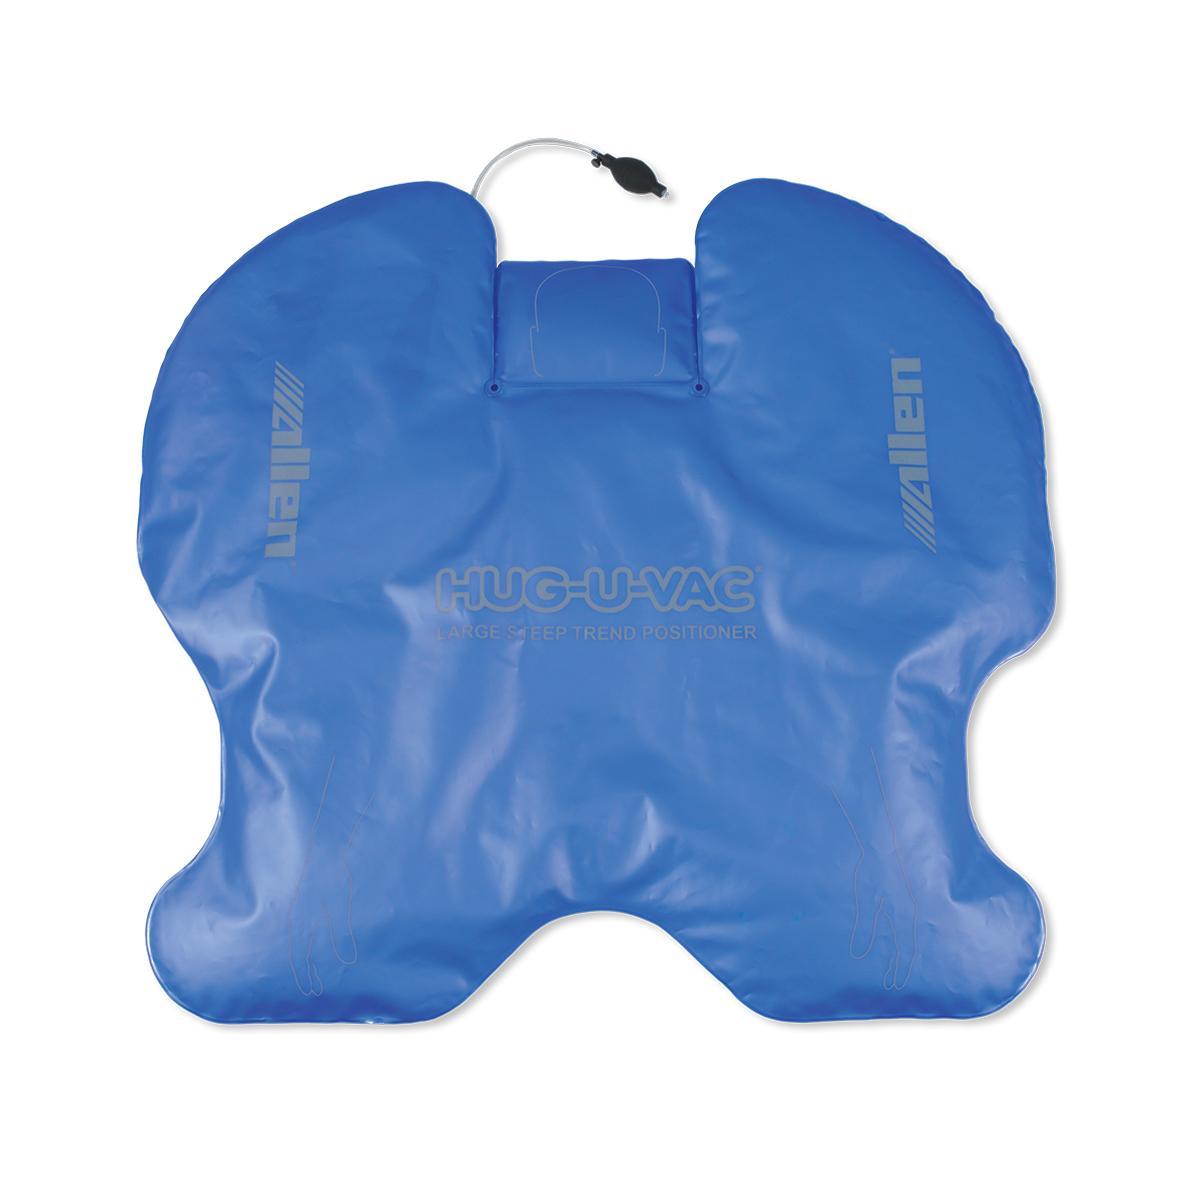 Allen® Hug-U-Vac® Large Steep Trend Positioner, #A-60005